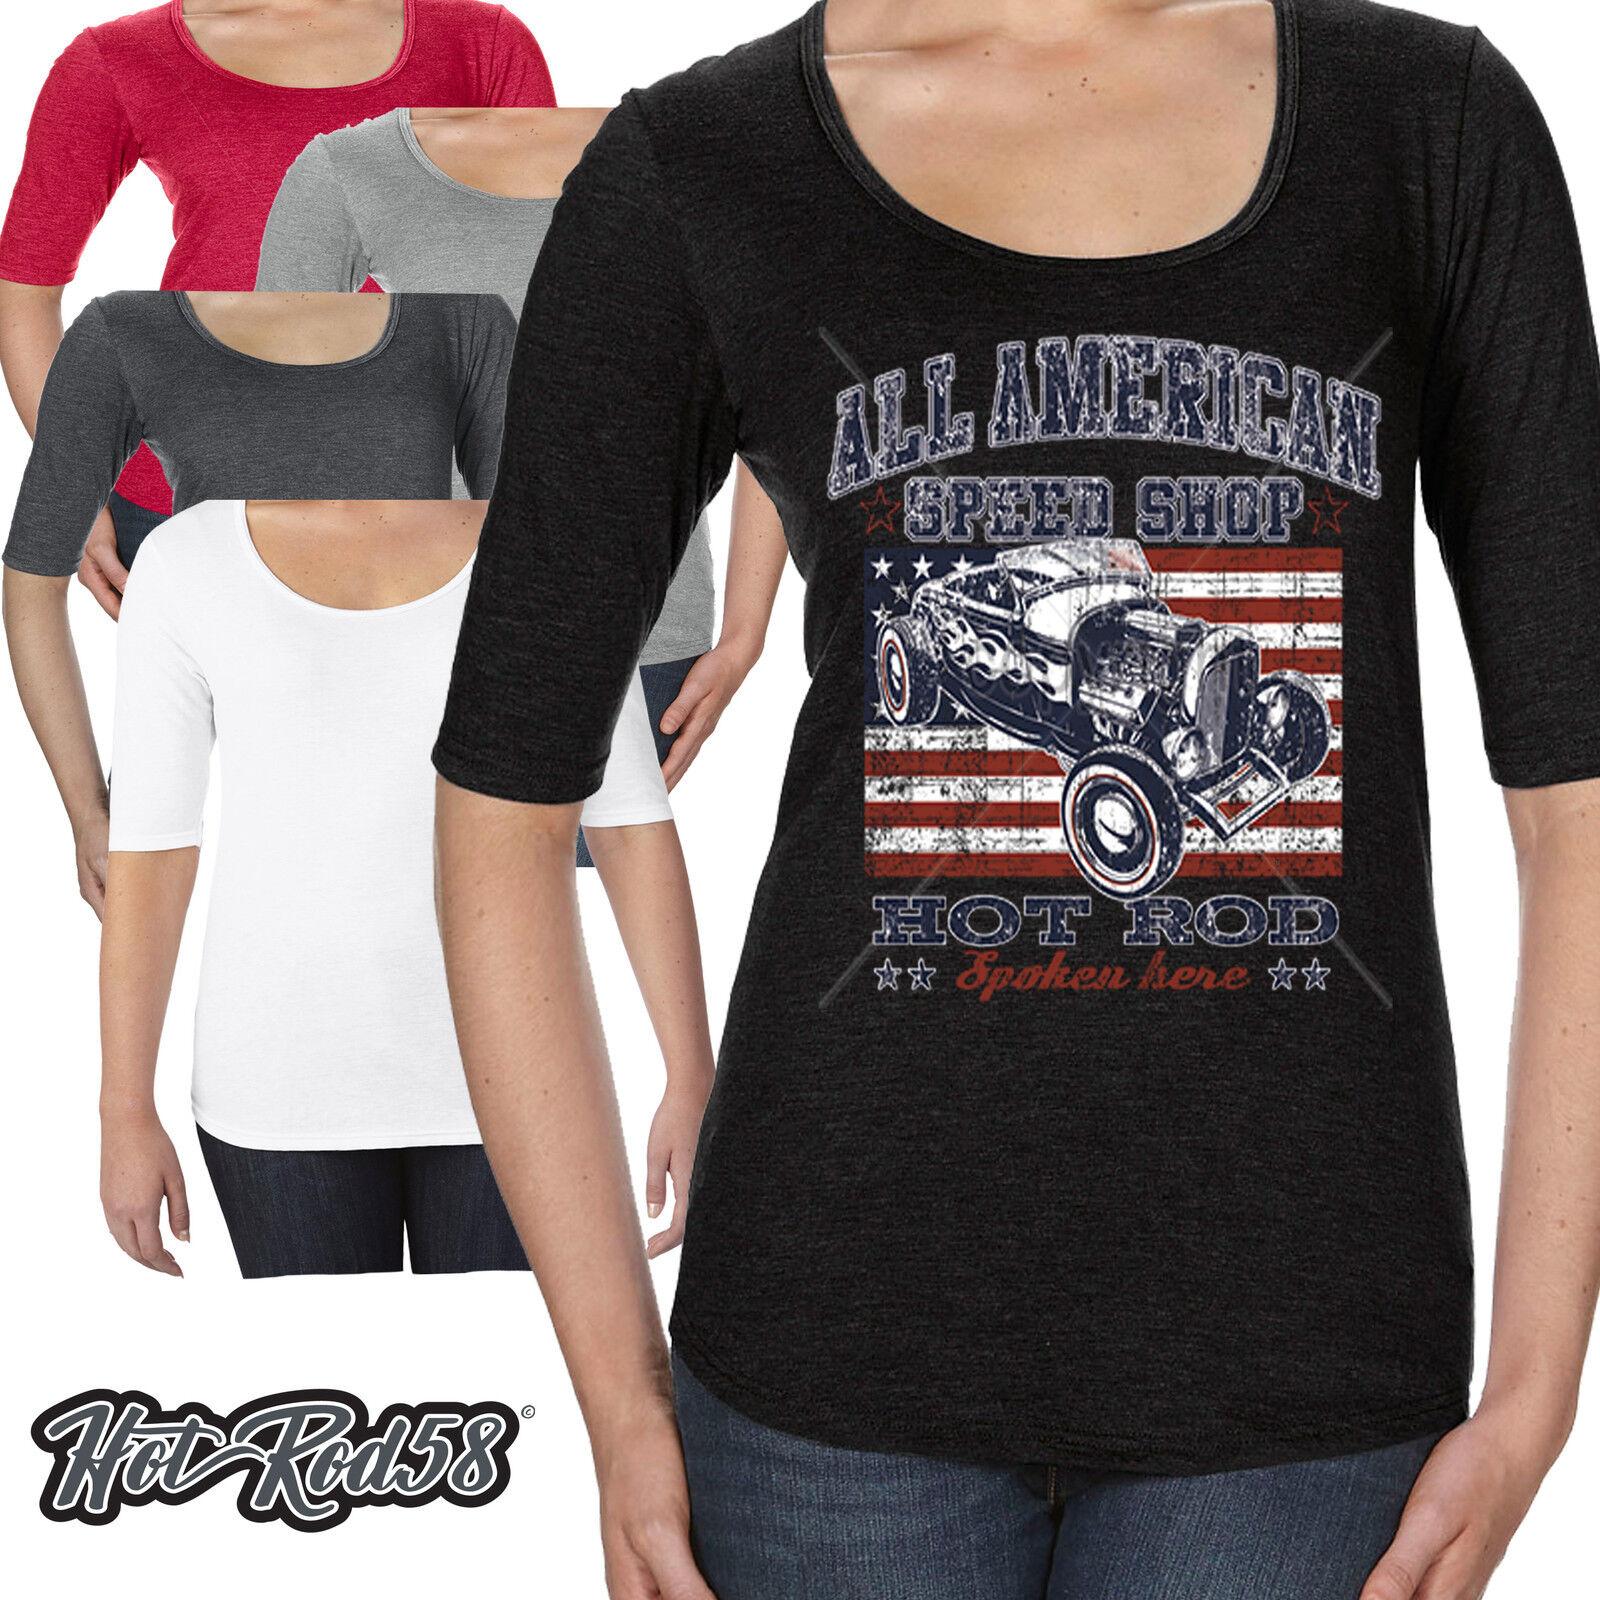 Mesdames hotrod neck scoop neck hotrod t shirt american speed shop voiture garage rockabilly 213 705887